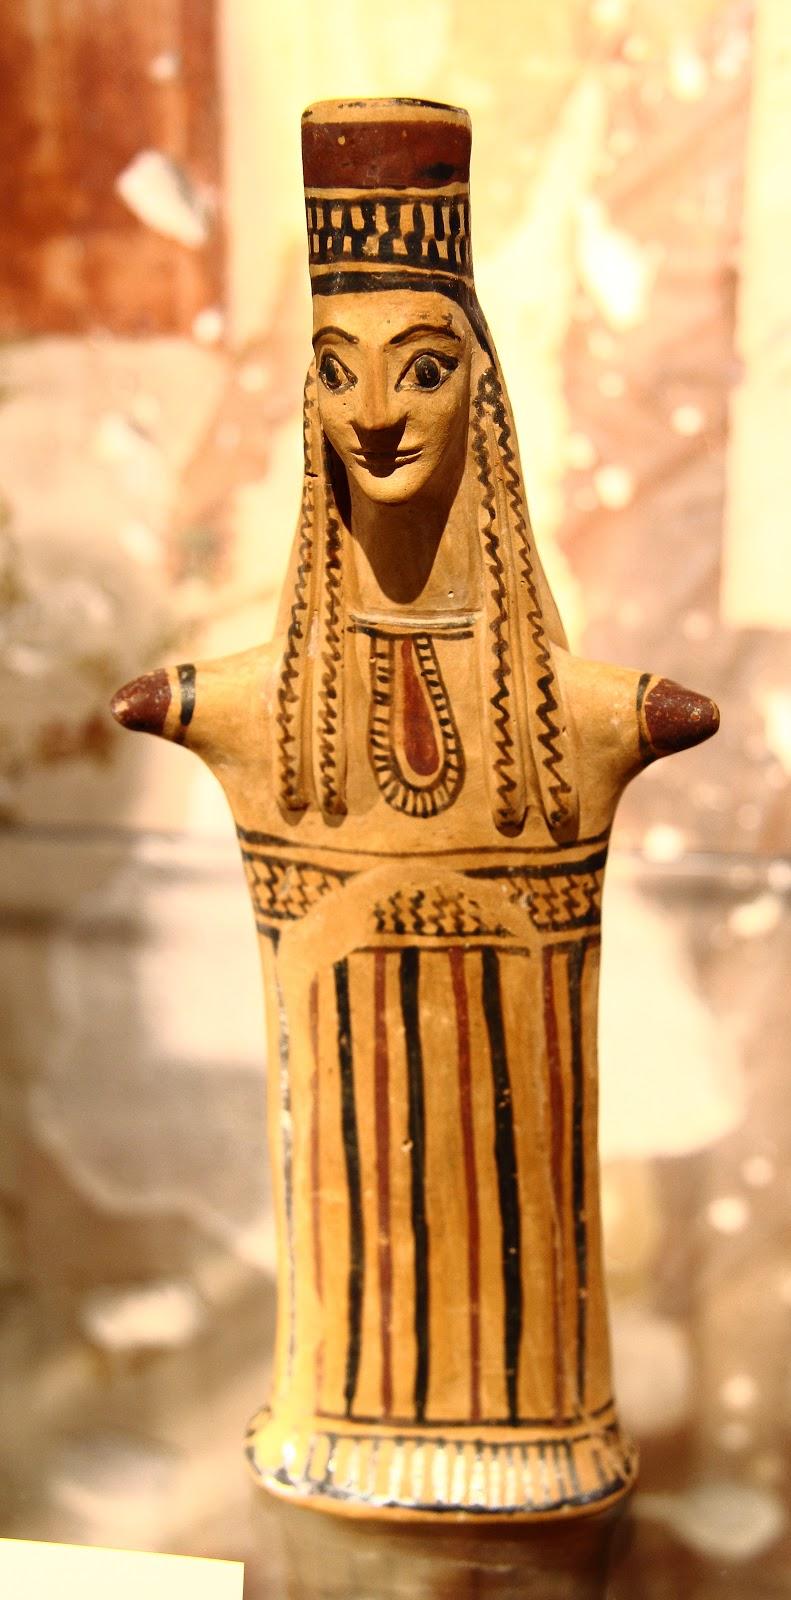 Goddess (Hera), Boetia, 6th c. B.C., Museum Aschaffenburg, photograph by Maulaff.